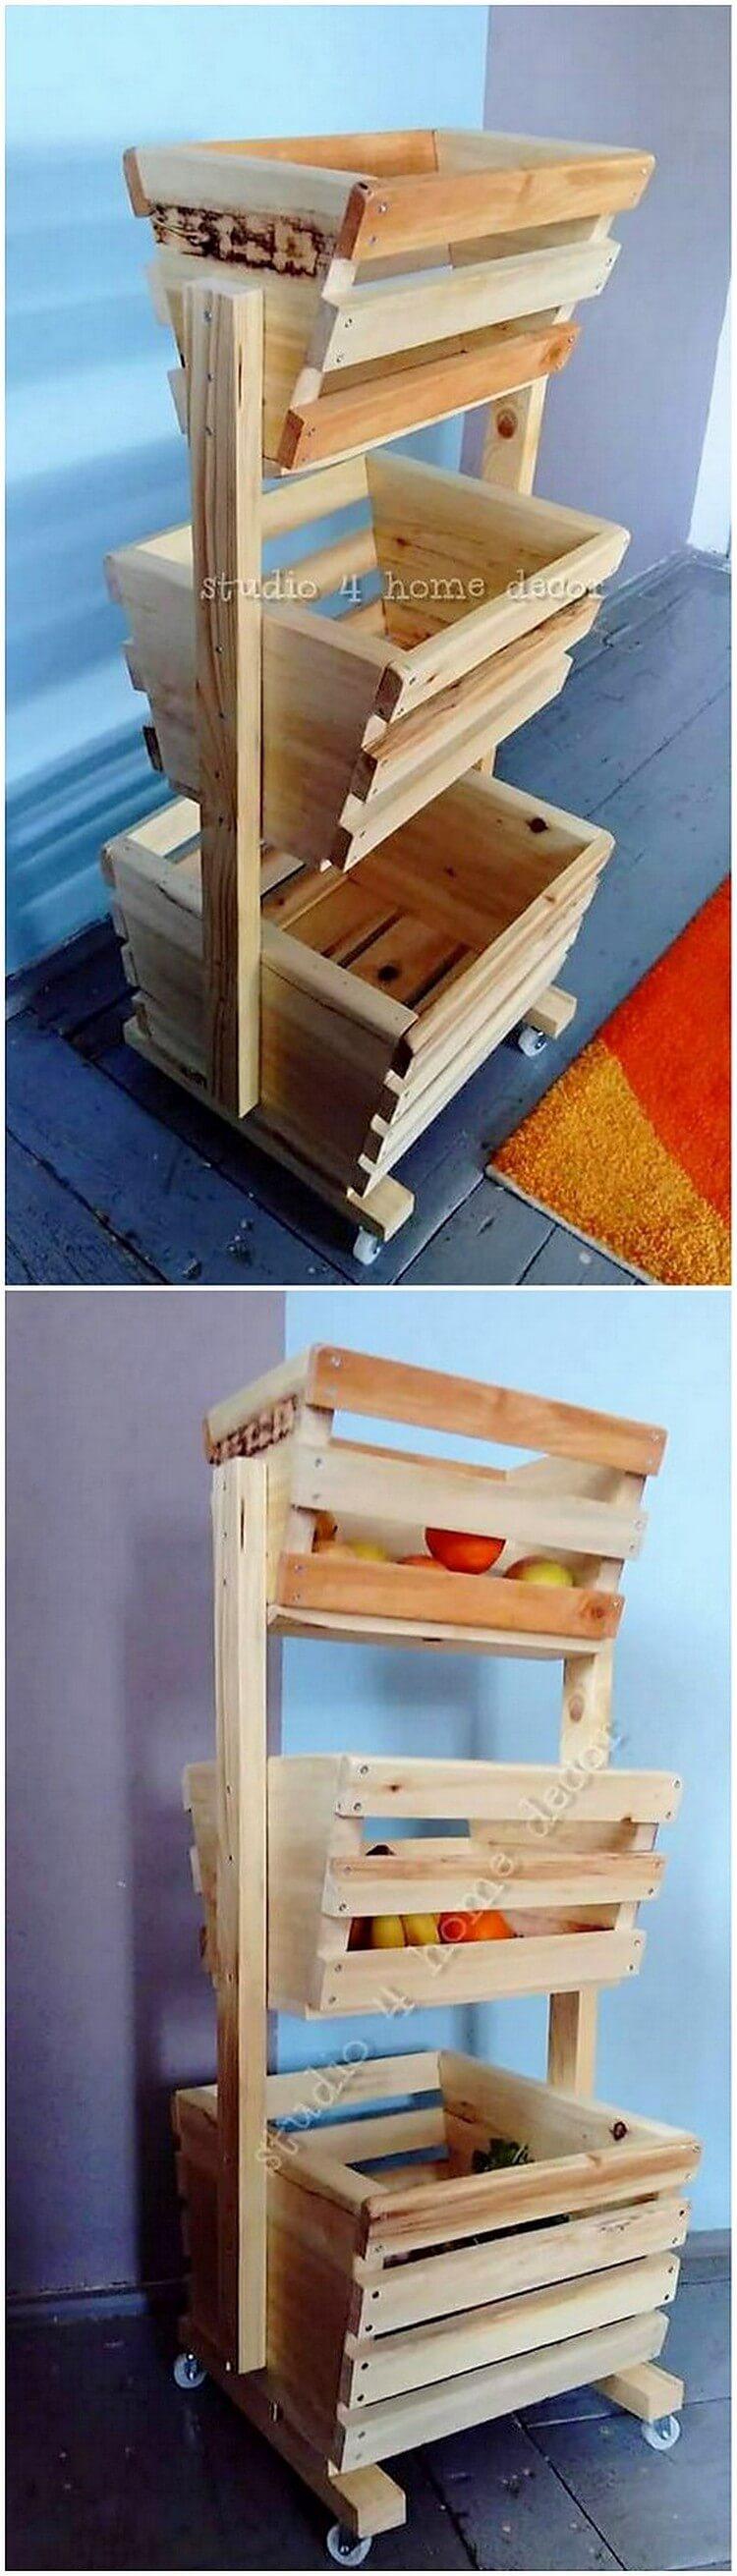 Pallet Vegetable Rack